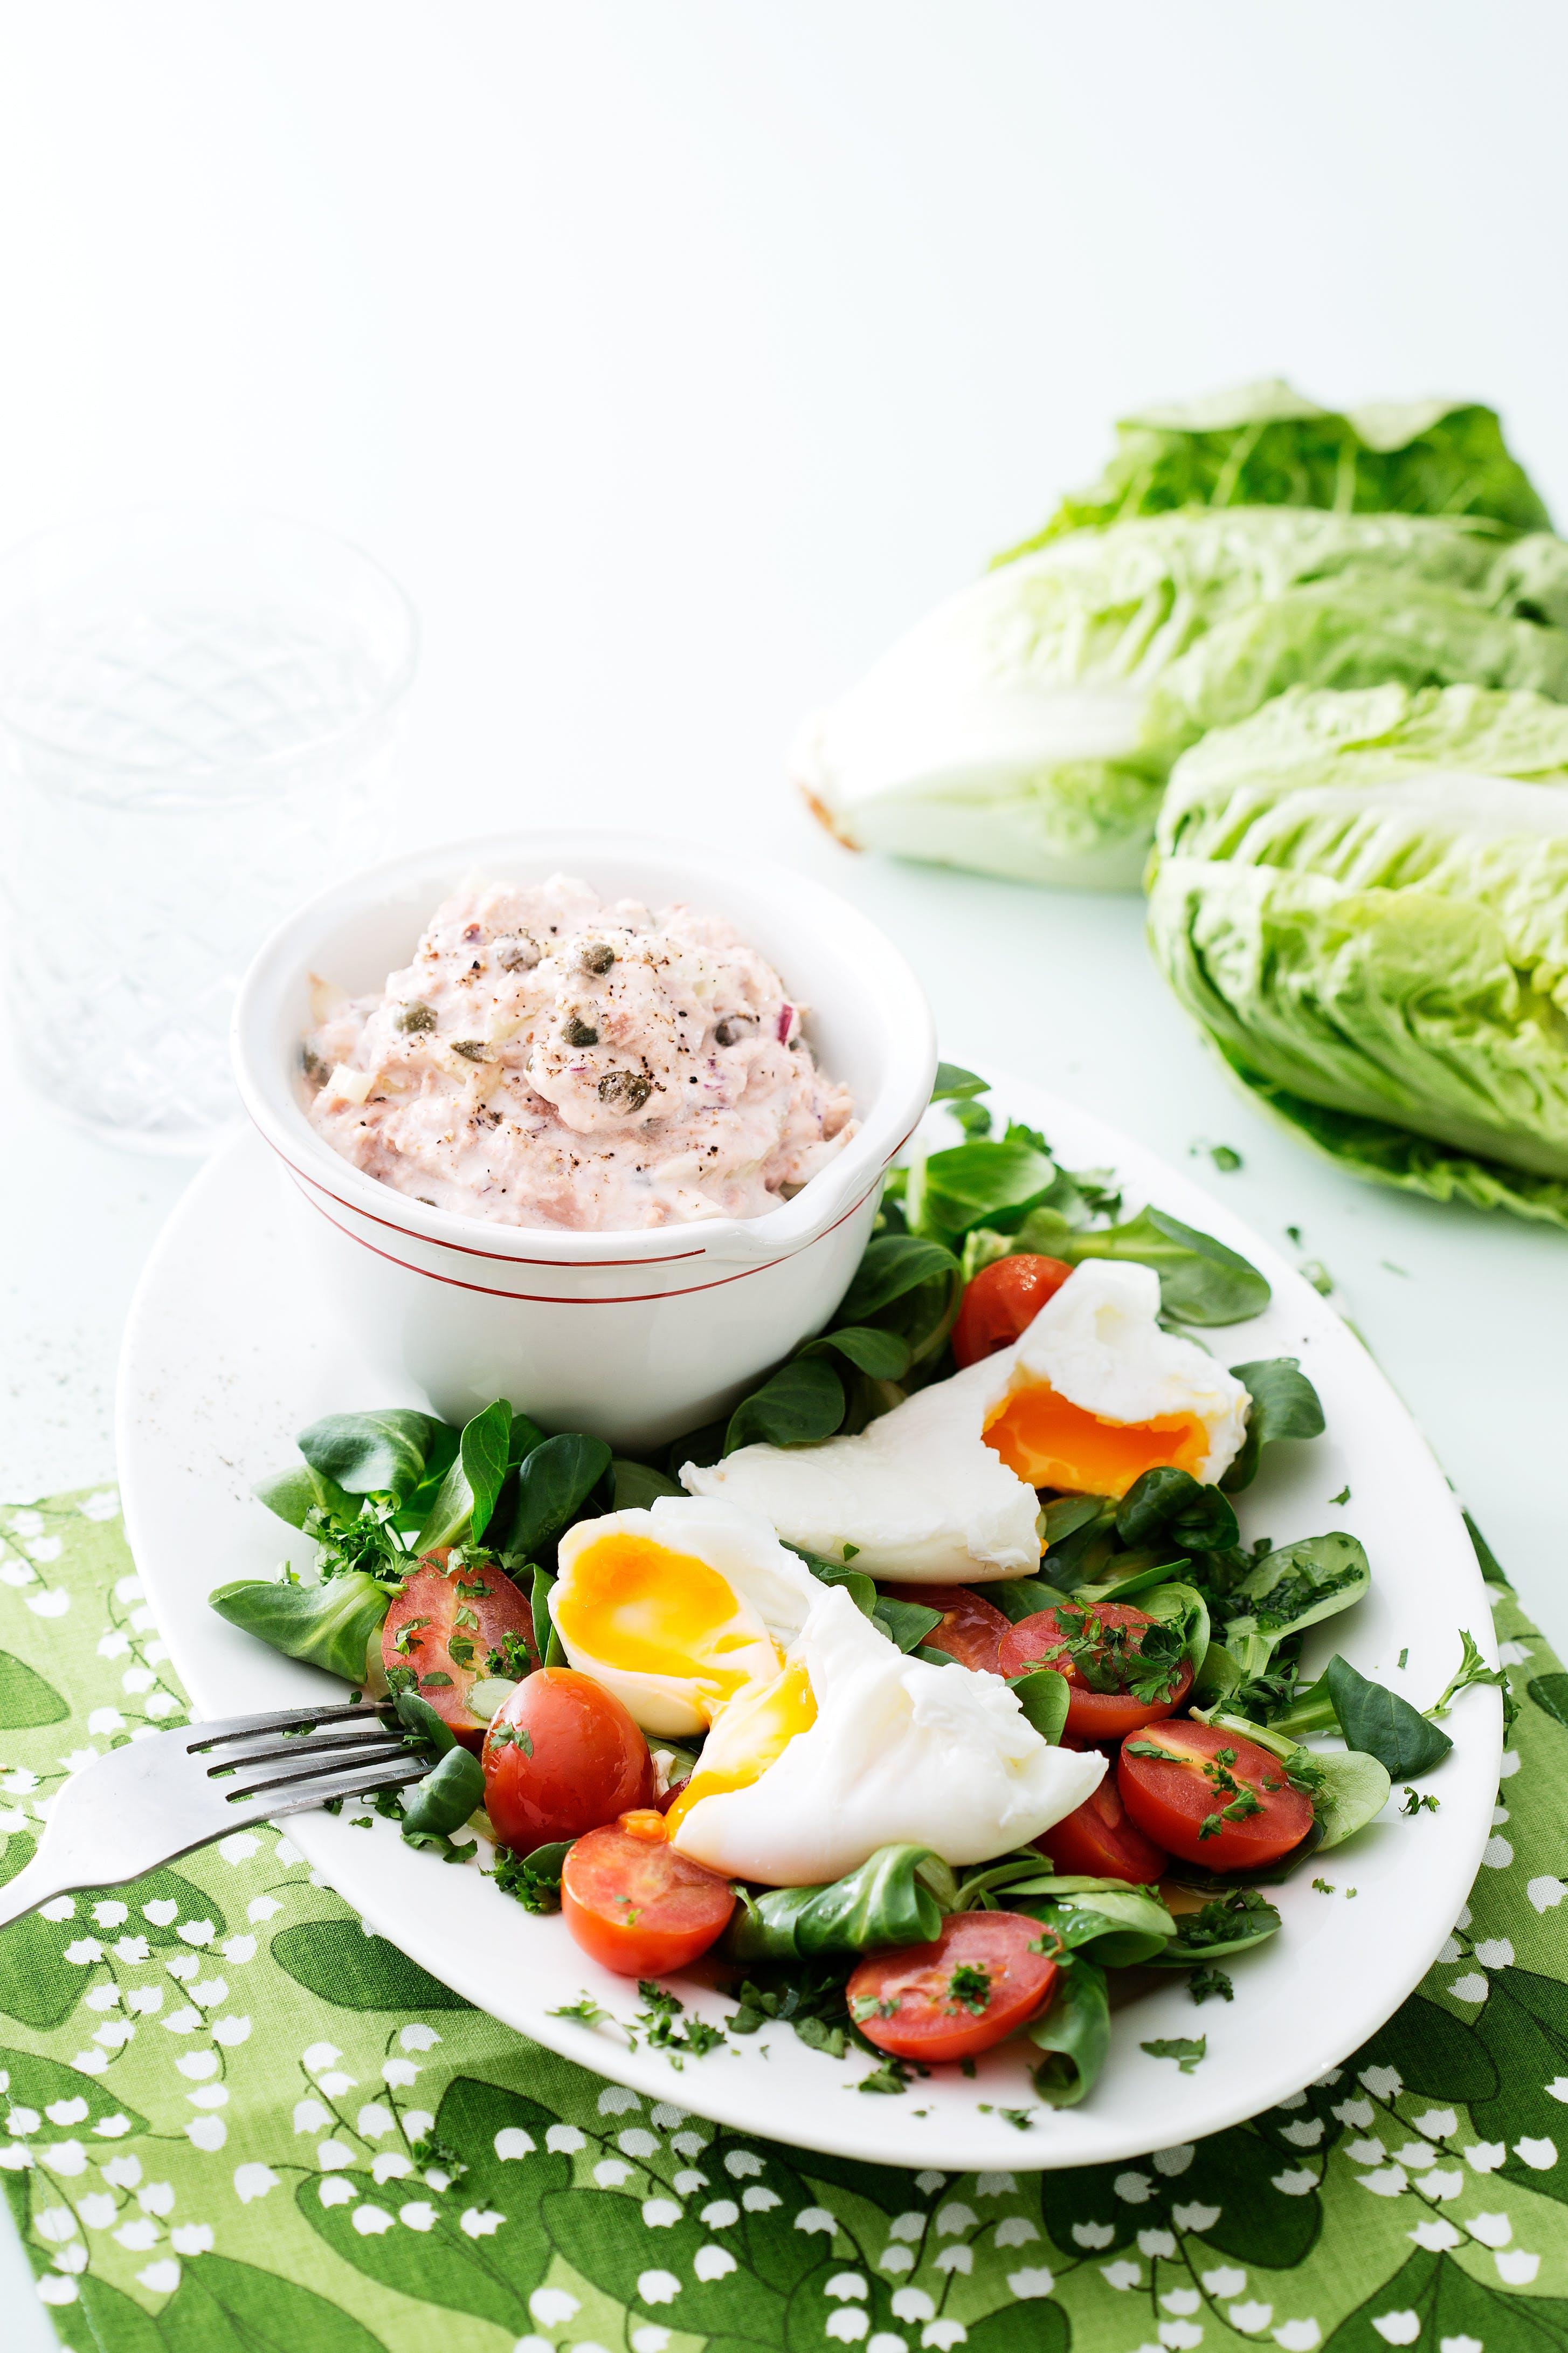 Keto tuna salad with poached eggs